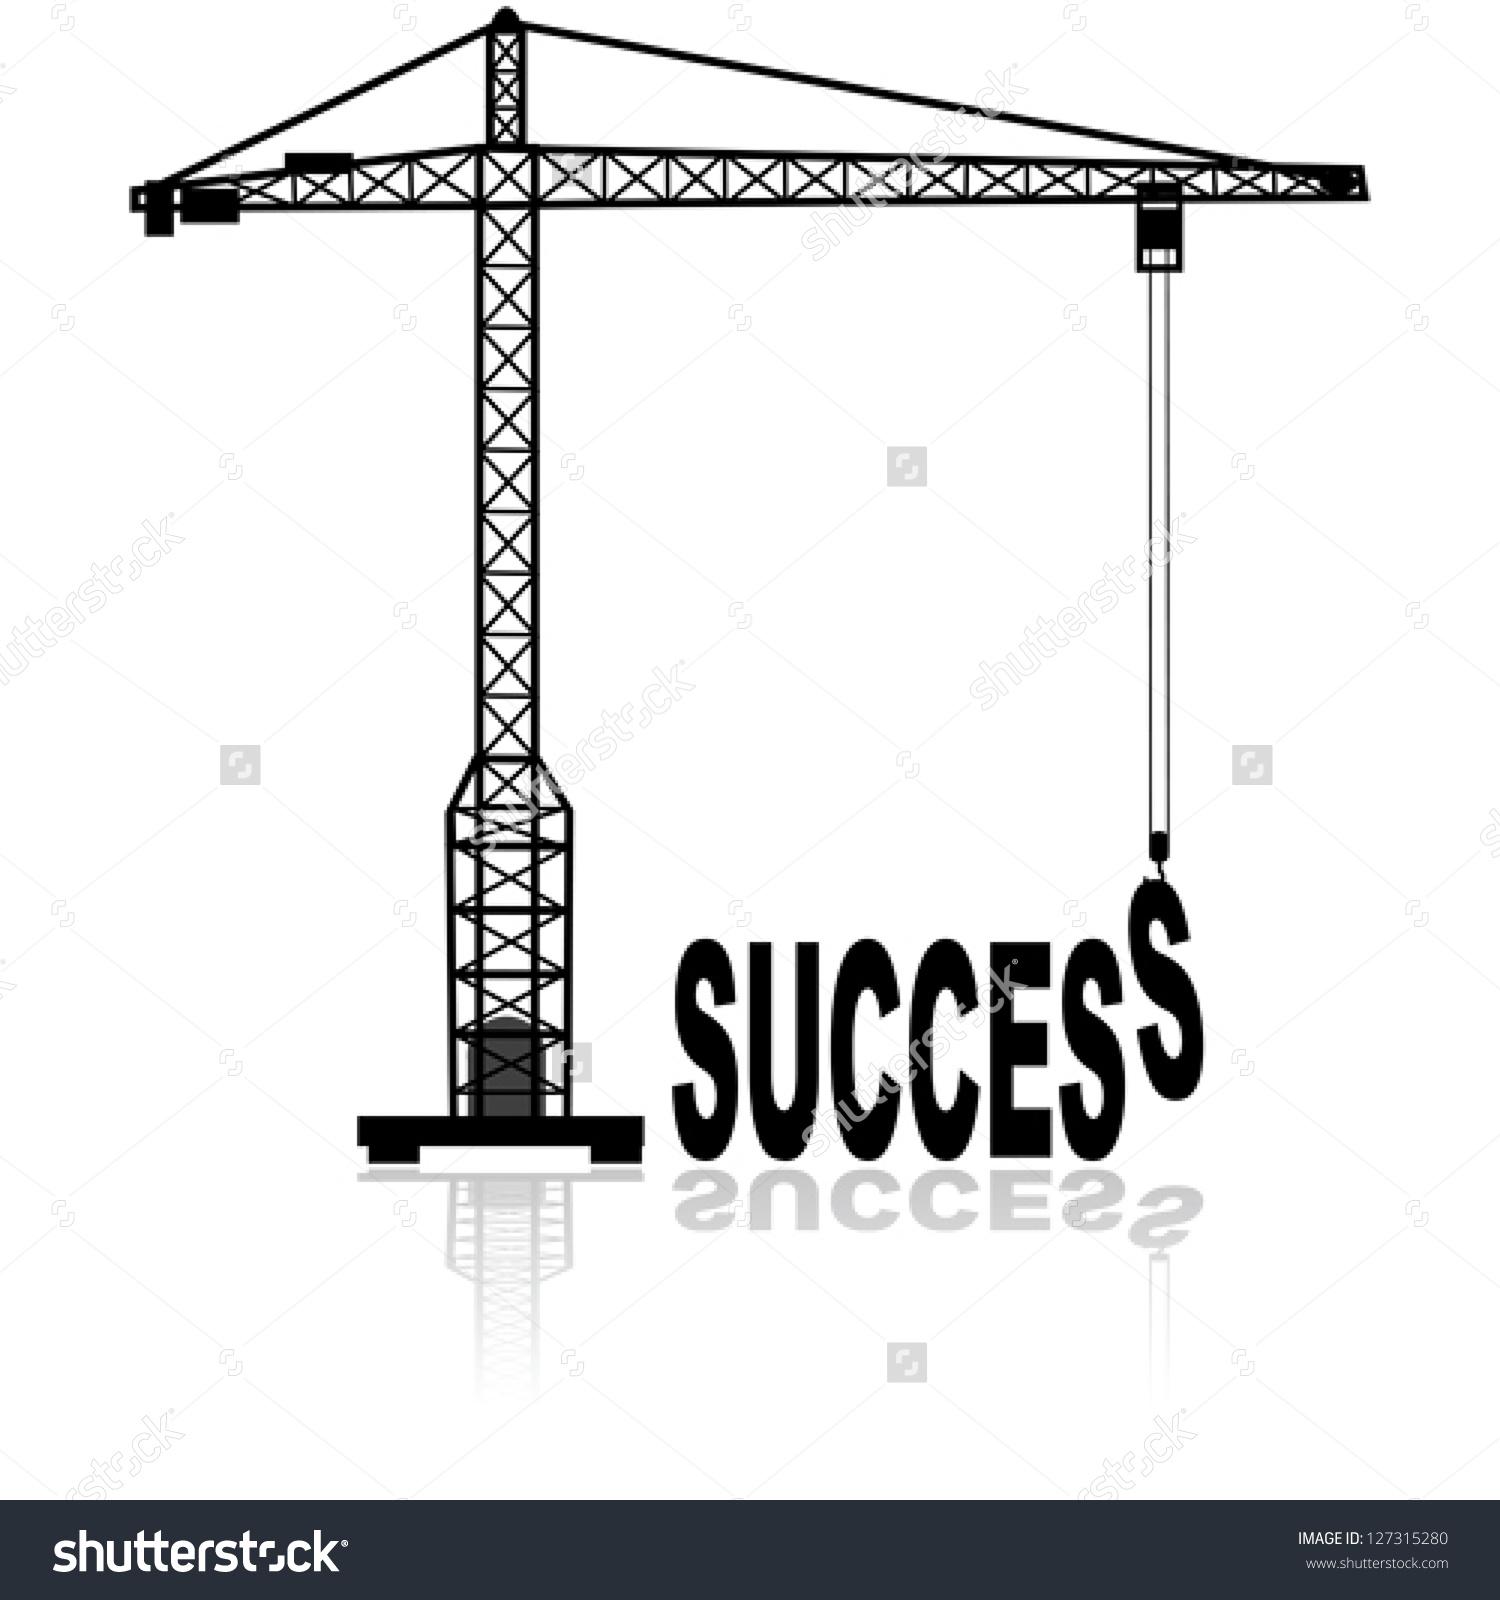 Concept Vector Illustration Showing Construction Crane Stock.